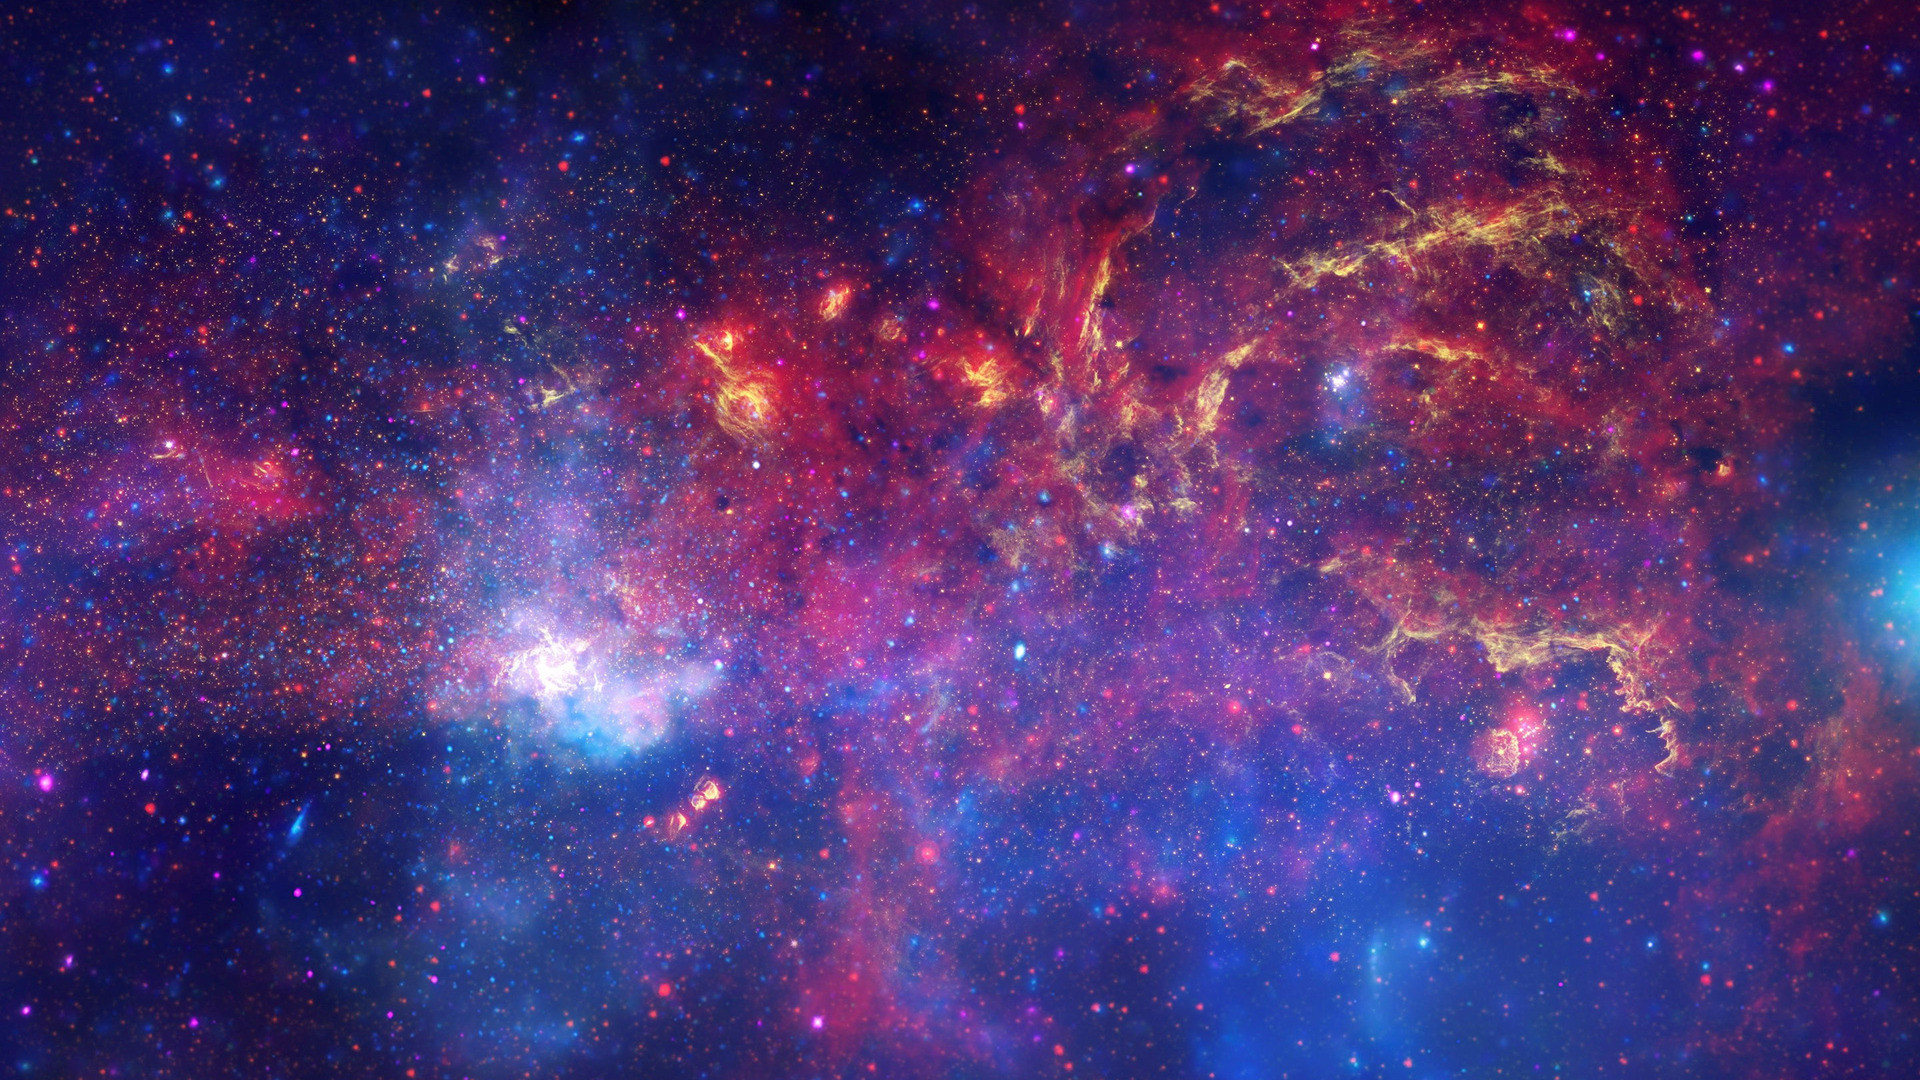 Purple Galaxy hd Wallpaper 1080p Space Galaxy Wallpaper hd